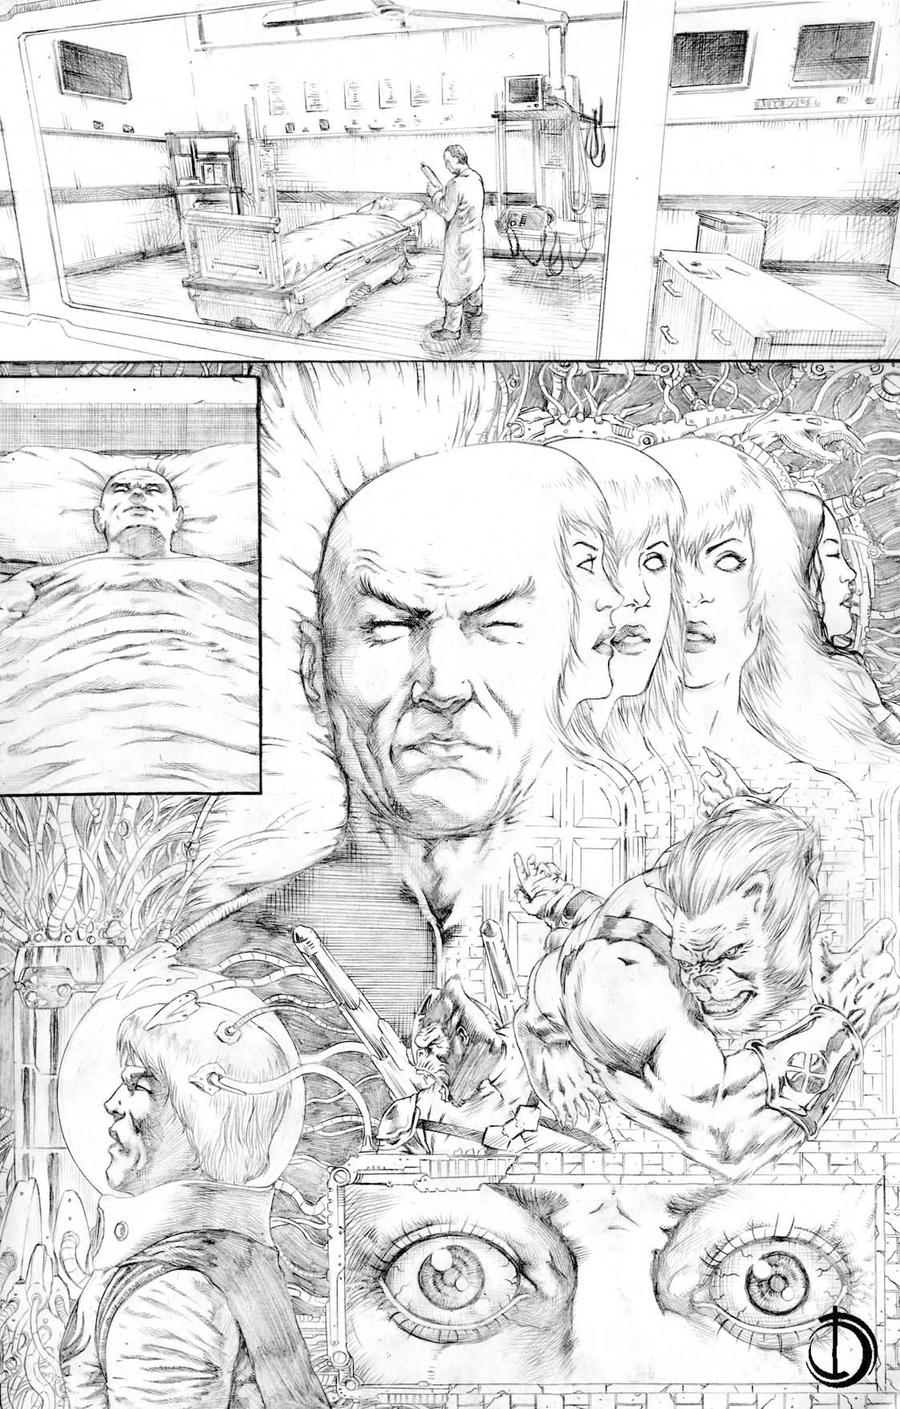 X-Men Vs Atlas 6 by santiagocomics